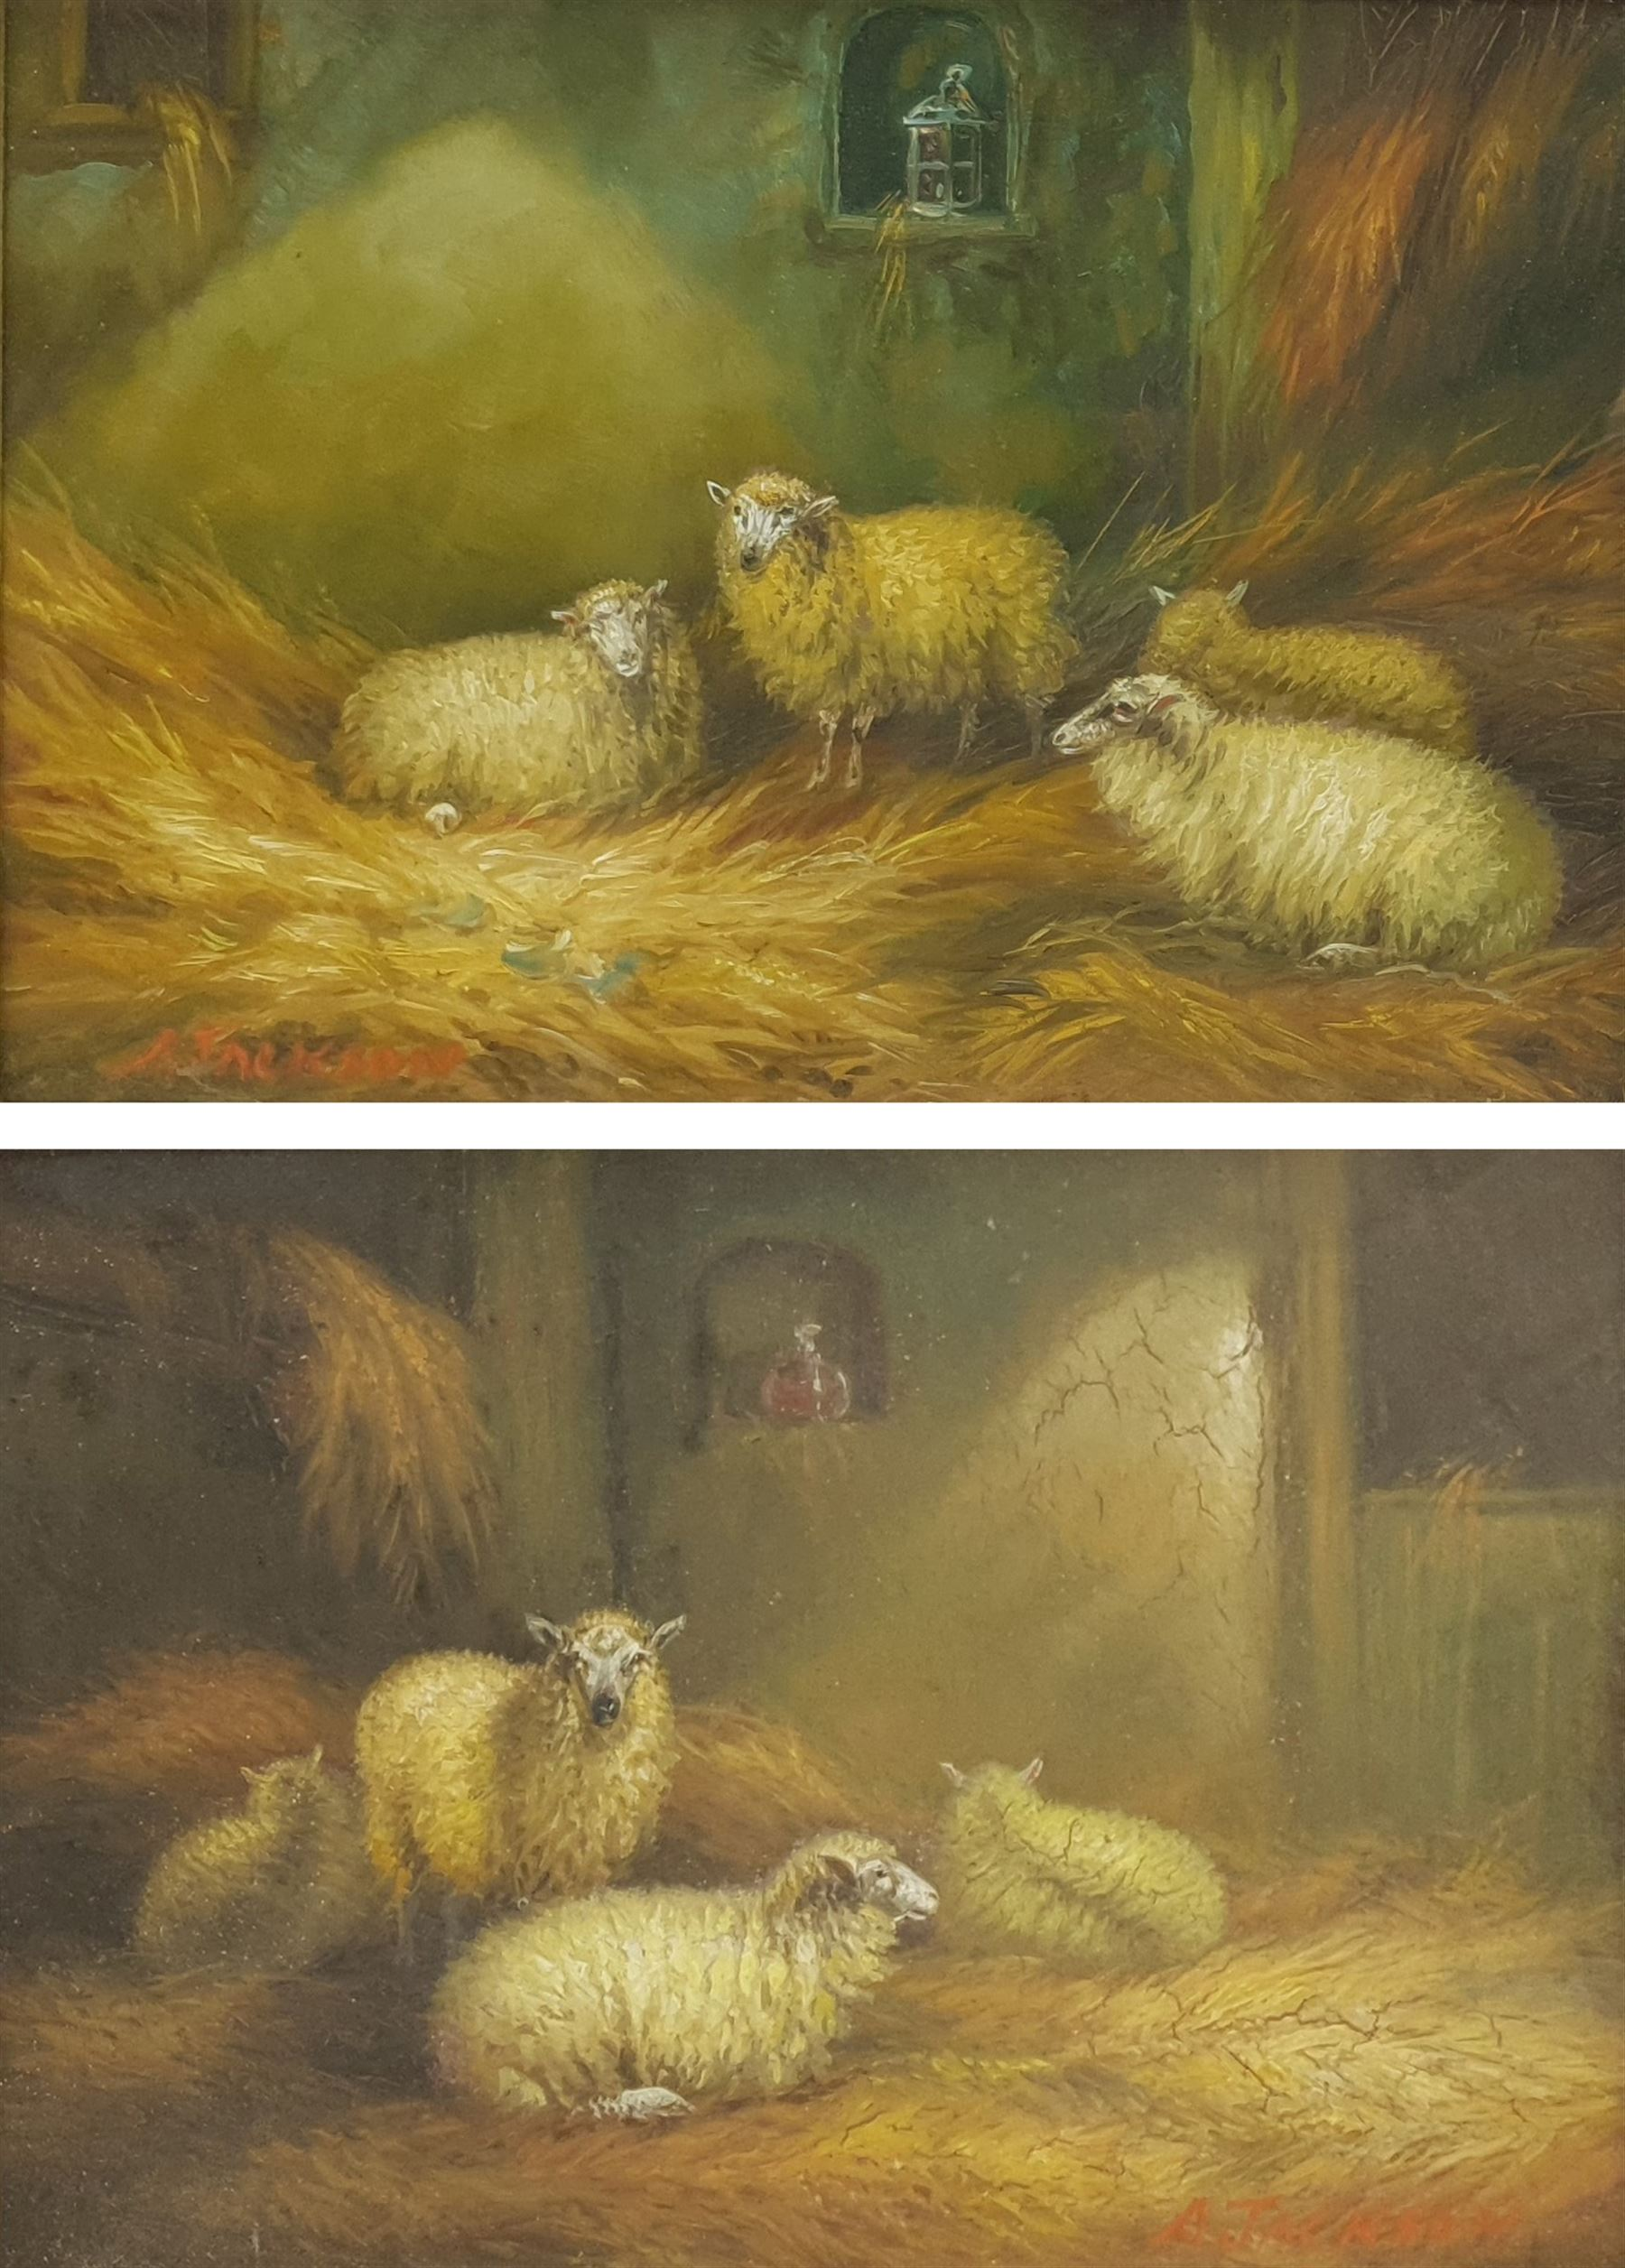 Arthur Jackson (British fl.1885-1910): Sheep in a Barn